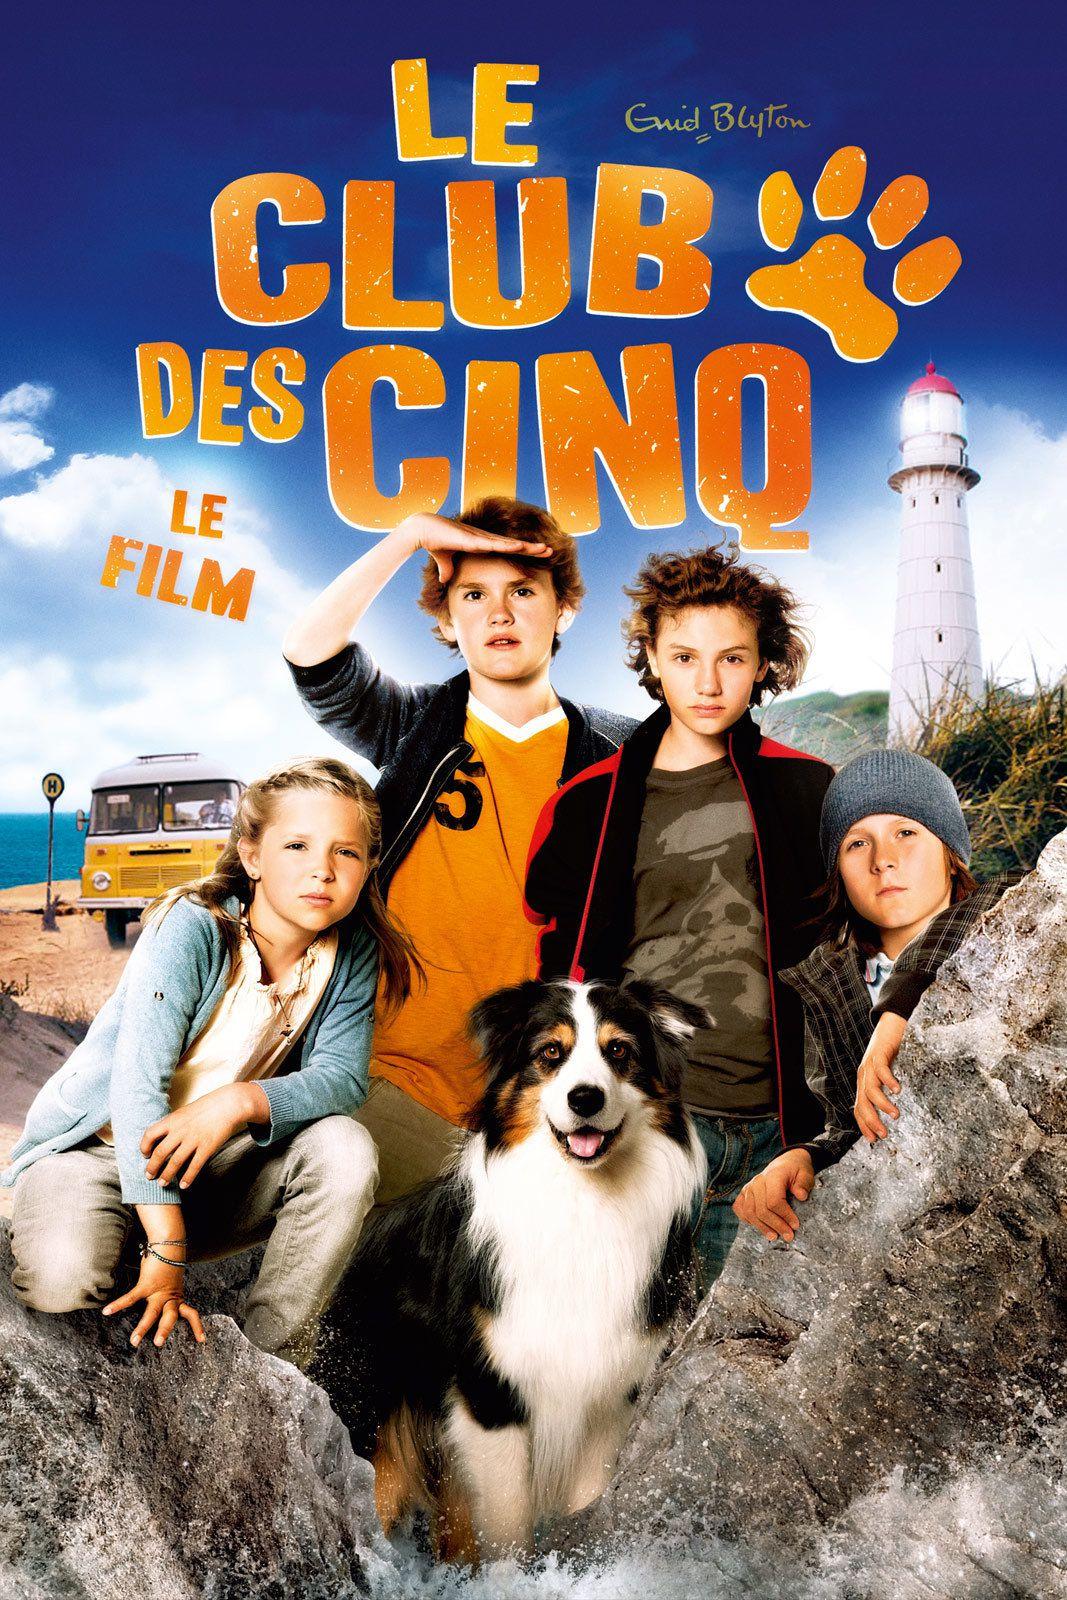 Le Club des Cinq : Le Film - Film (2012)